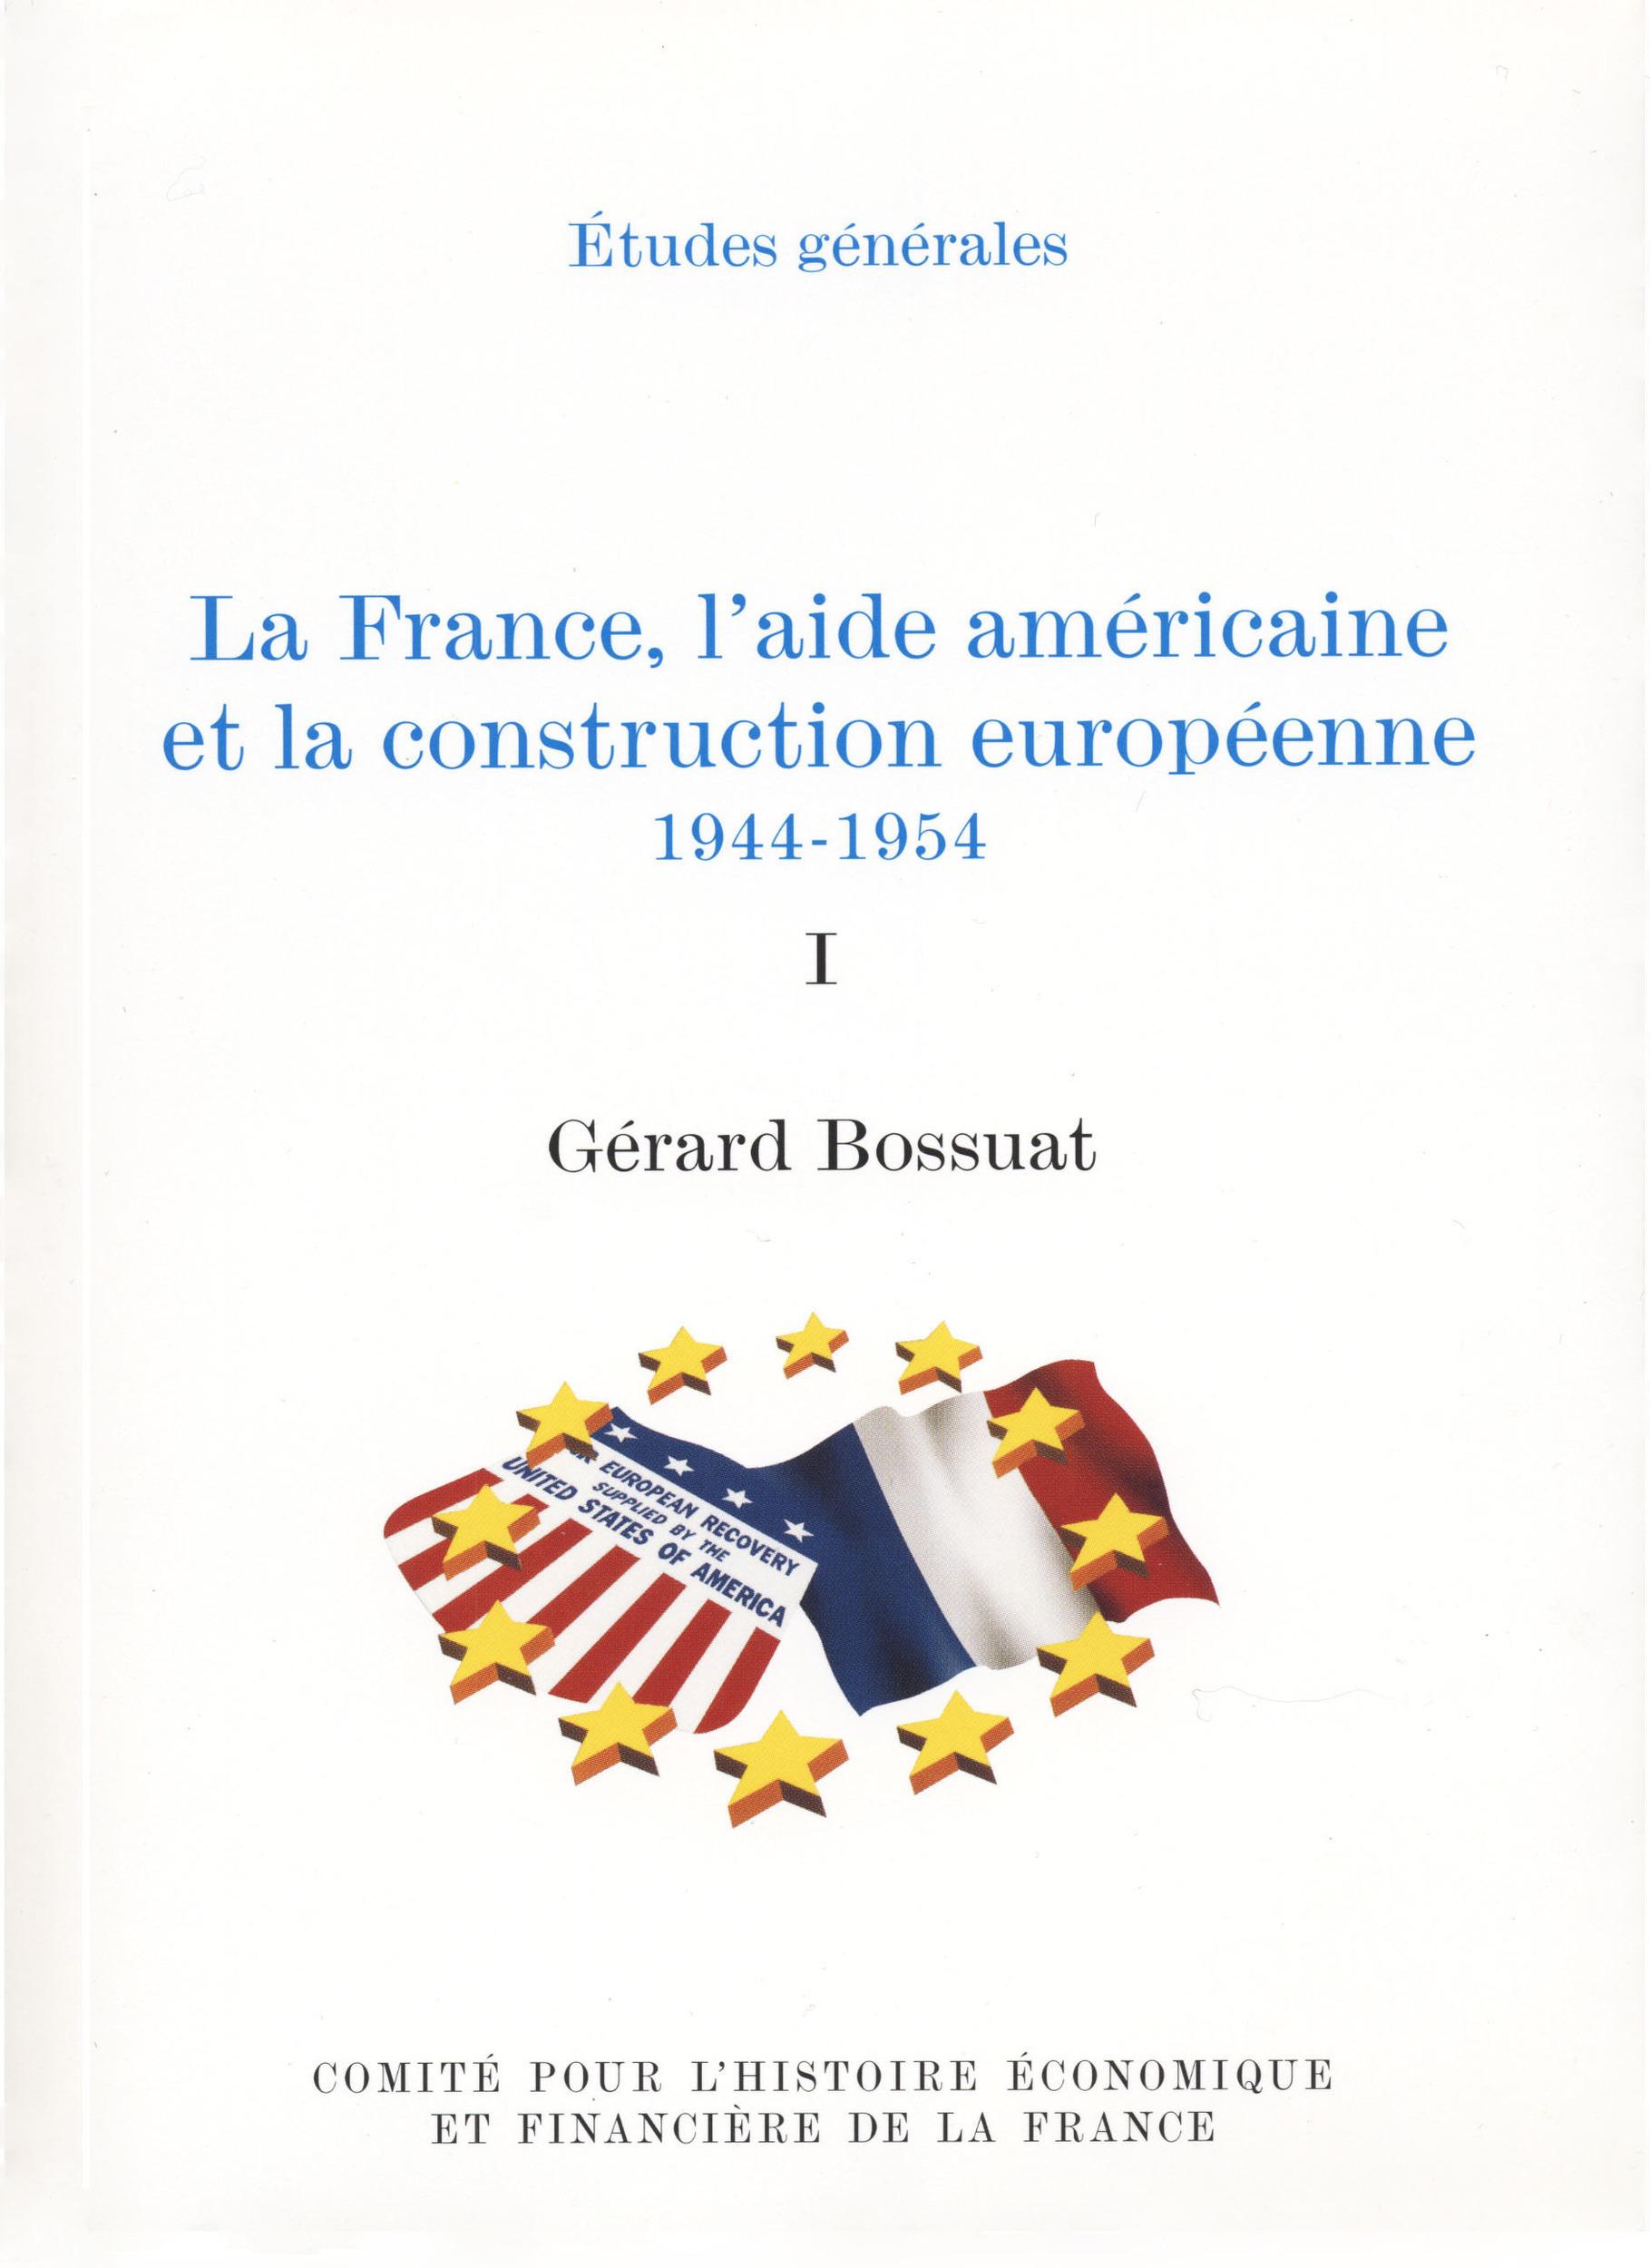 La france,aide americaine et construction europeenne,1944-1954.tomes i et ii